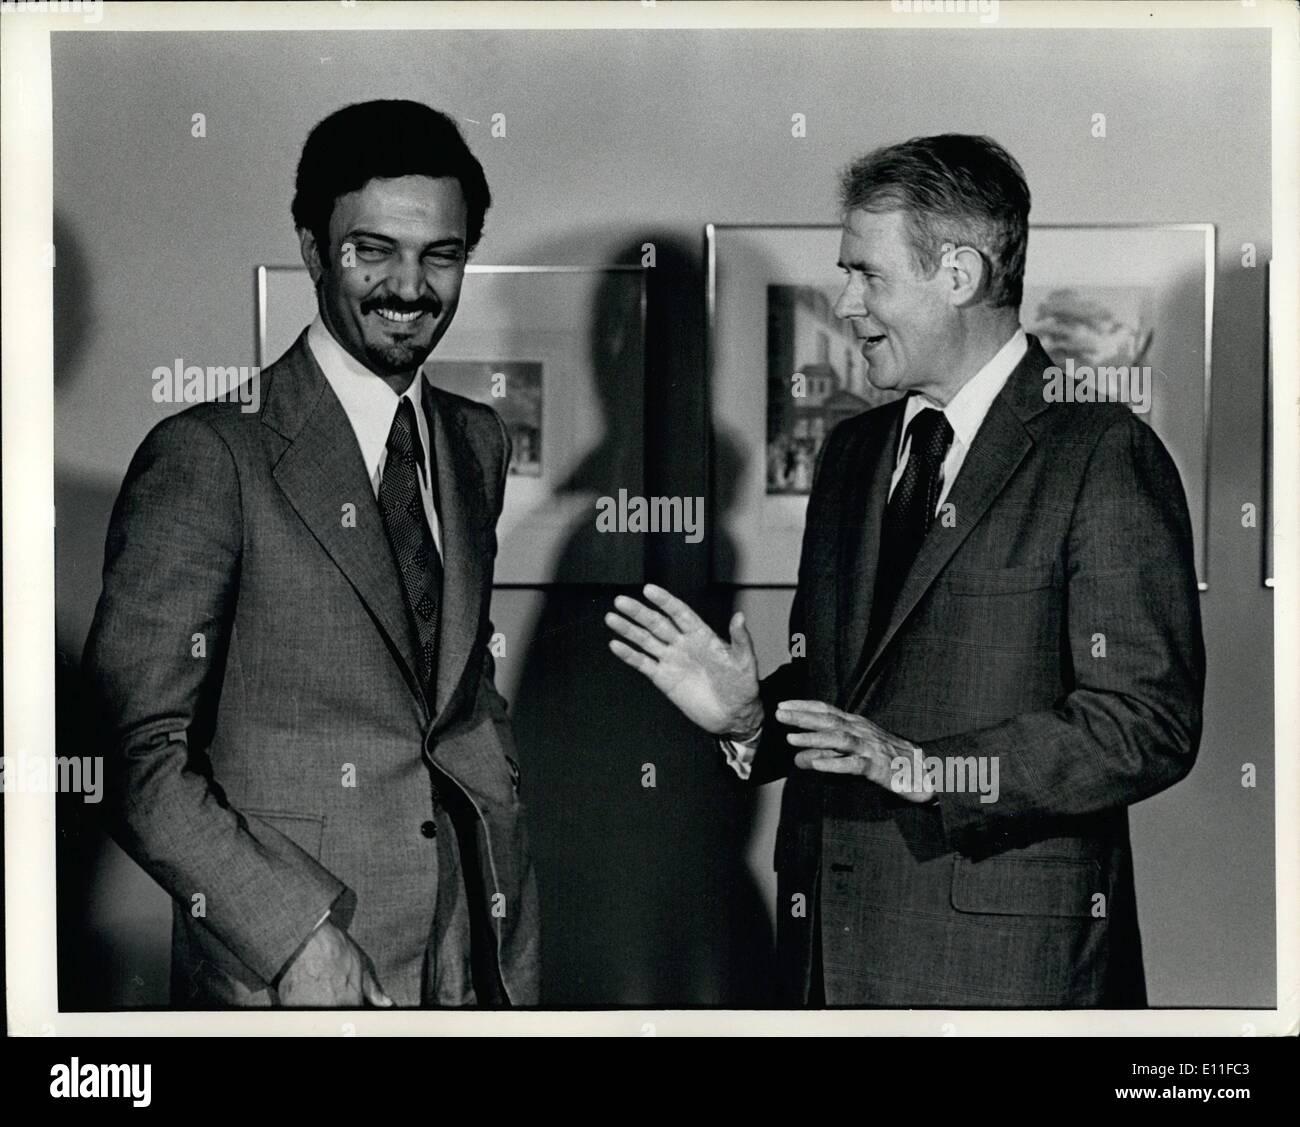 Prince Saud Stock Photos & Prince Saud Stock Images - Page 2